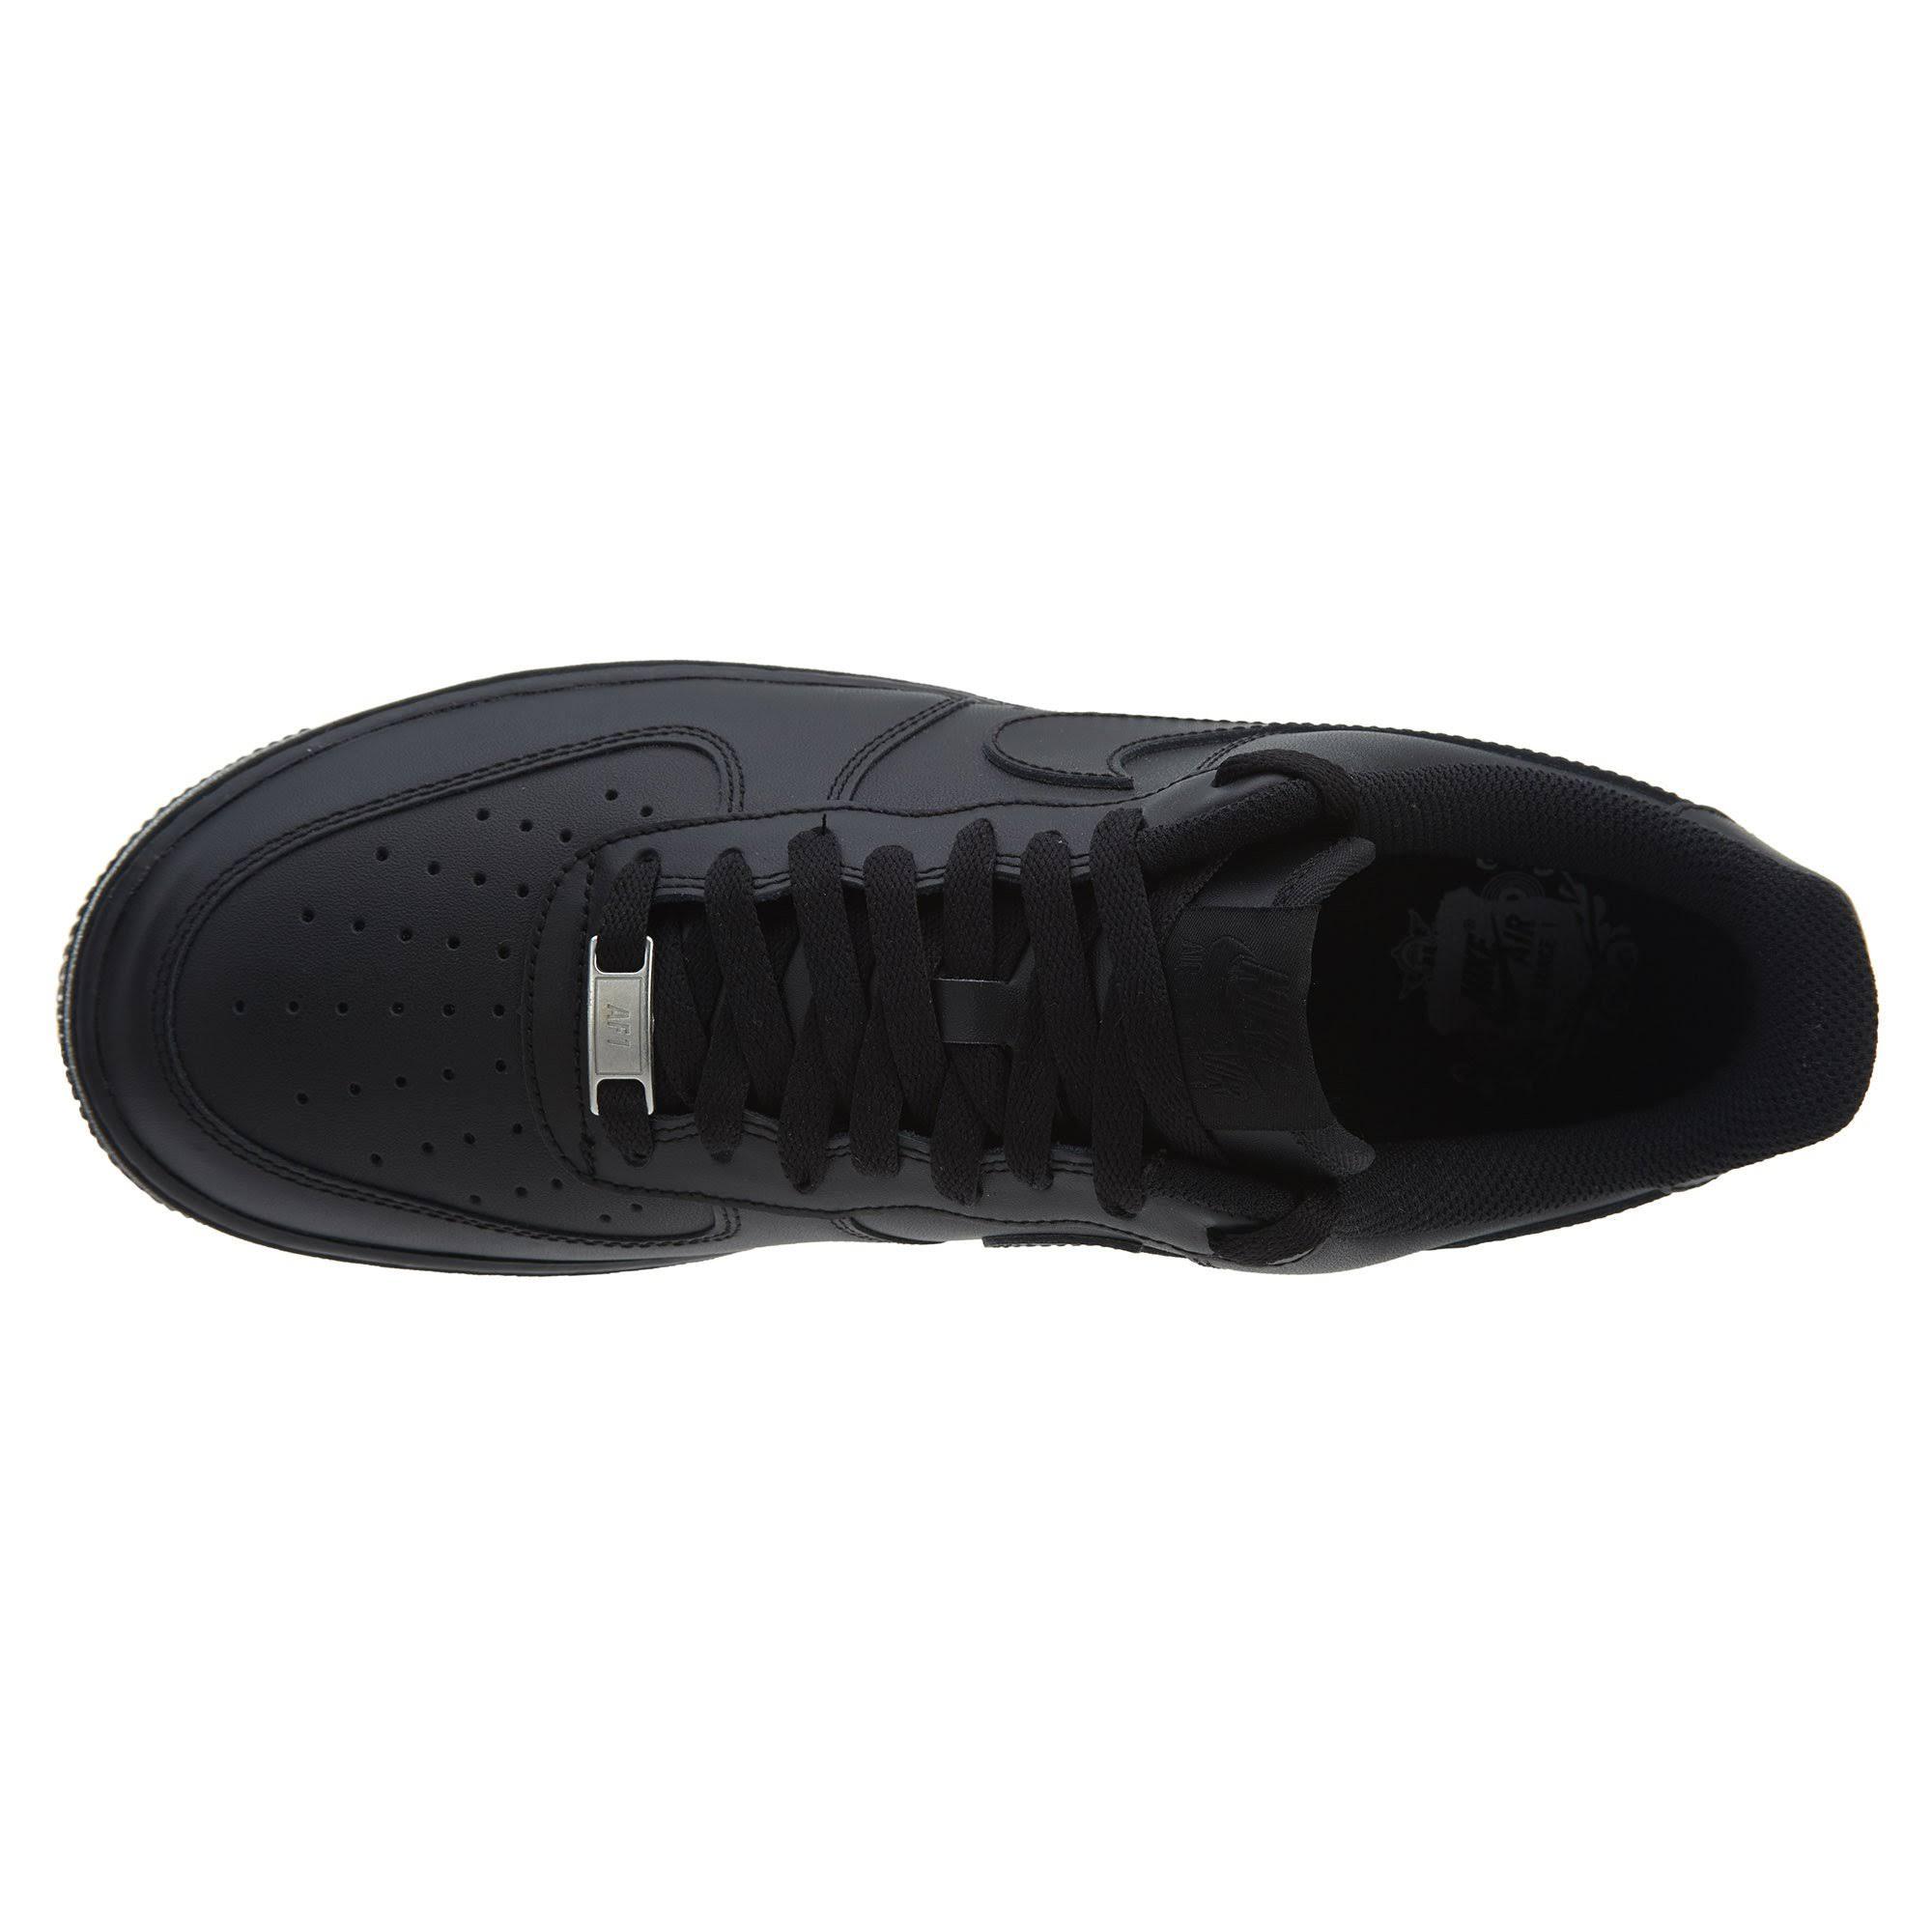 Nike Air Men's 5 Black 1 9 Black '07 Shoe Force rrfd1wqSx